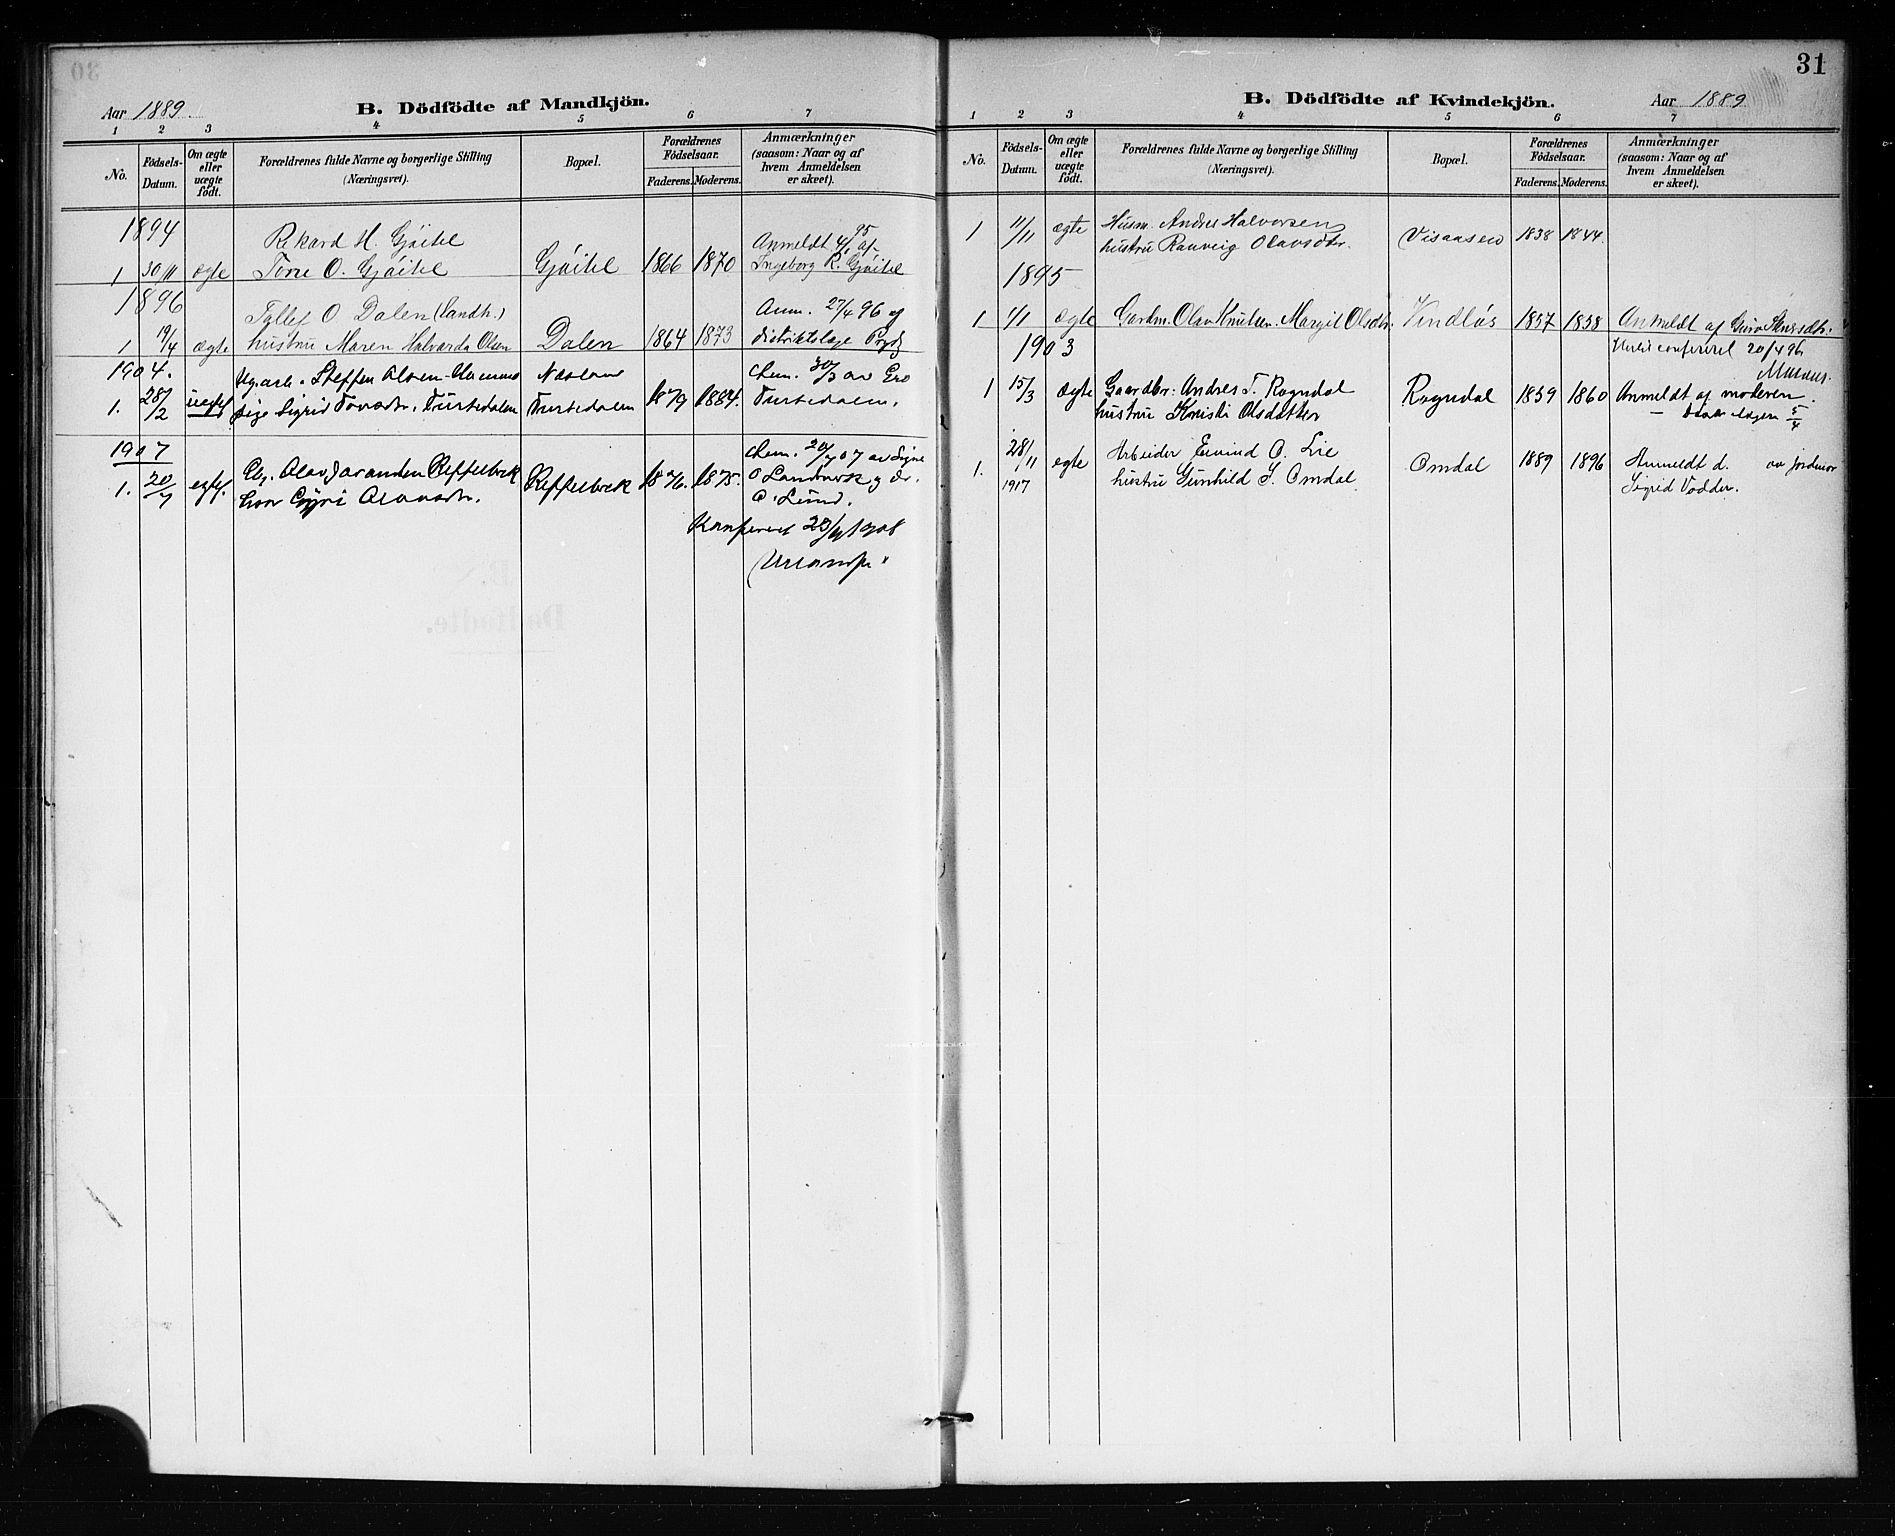 SAKO, Lårdal kirkebøker, G/Gb/L0003: Klokkerbok nr. II 3, 1889-1920, s. 31